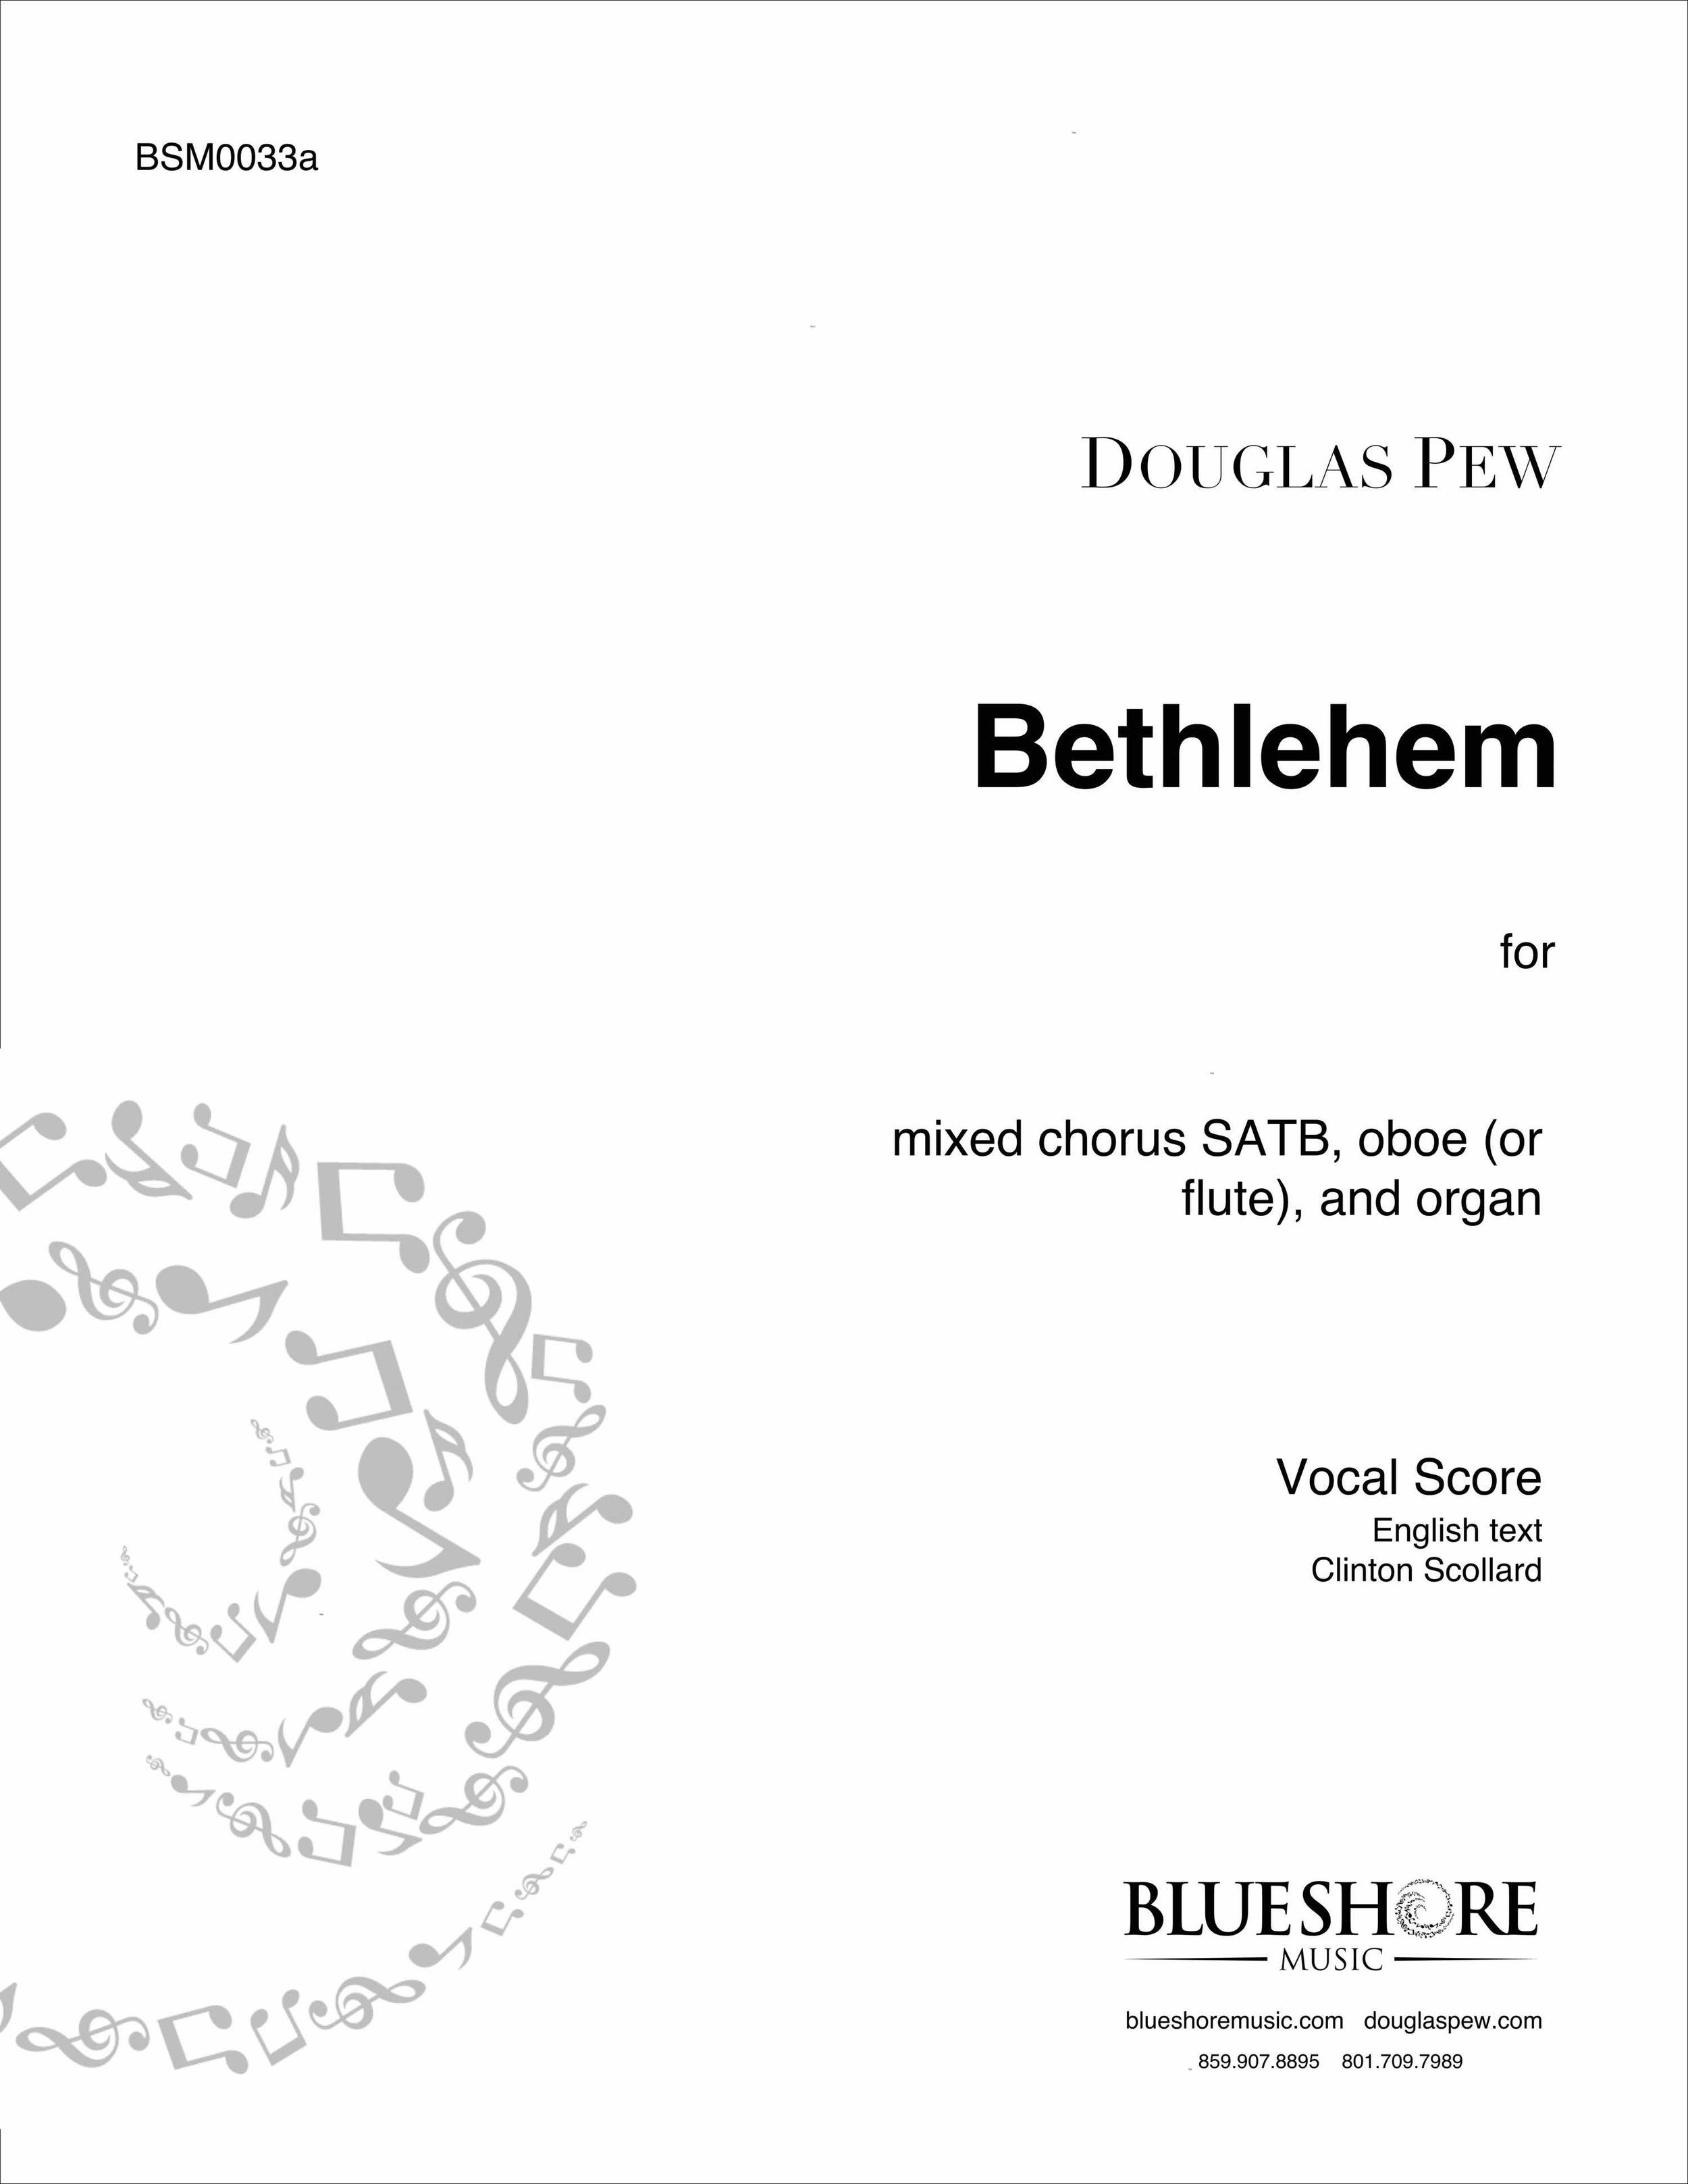 Bethlehem  - Christmas Carol for Mixed Chorus, Oboe (or Flute), and Organ